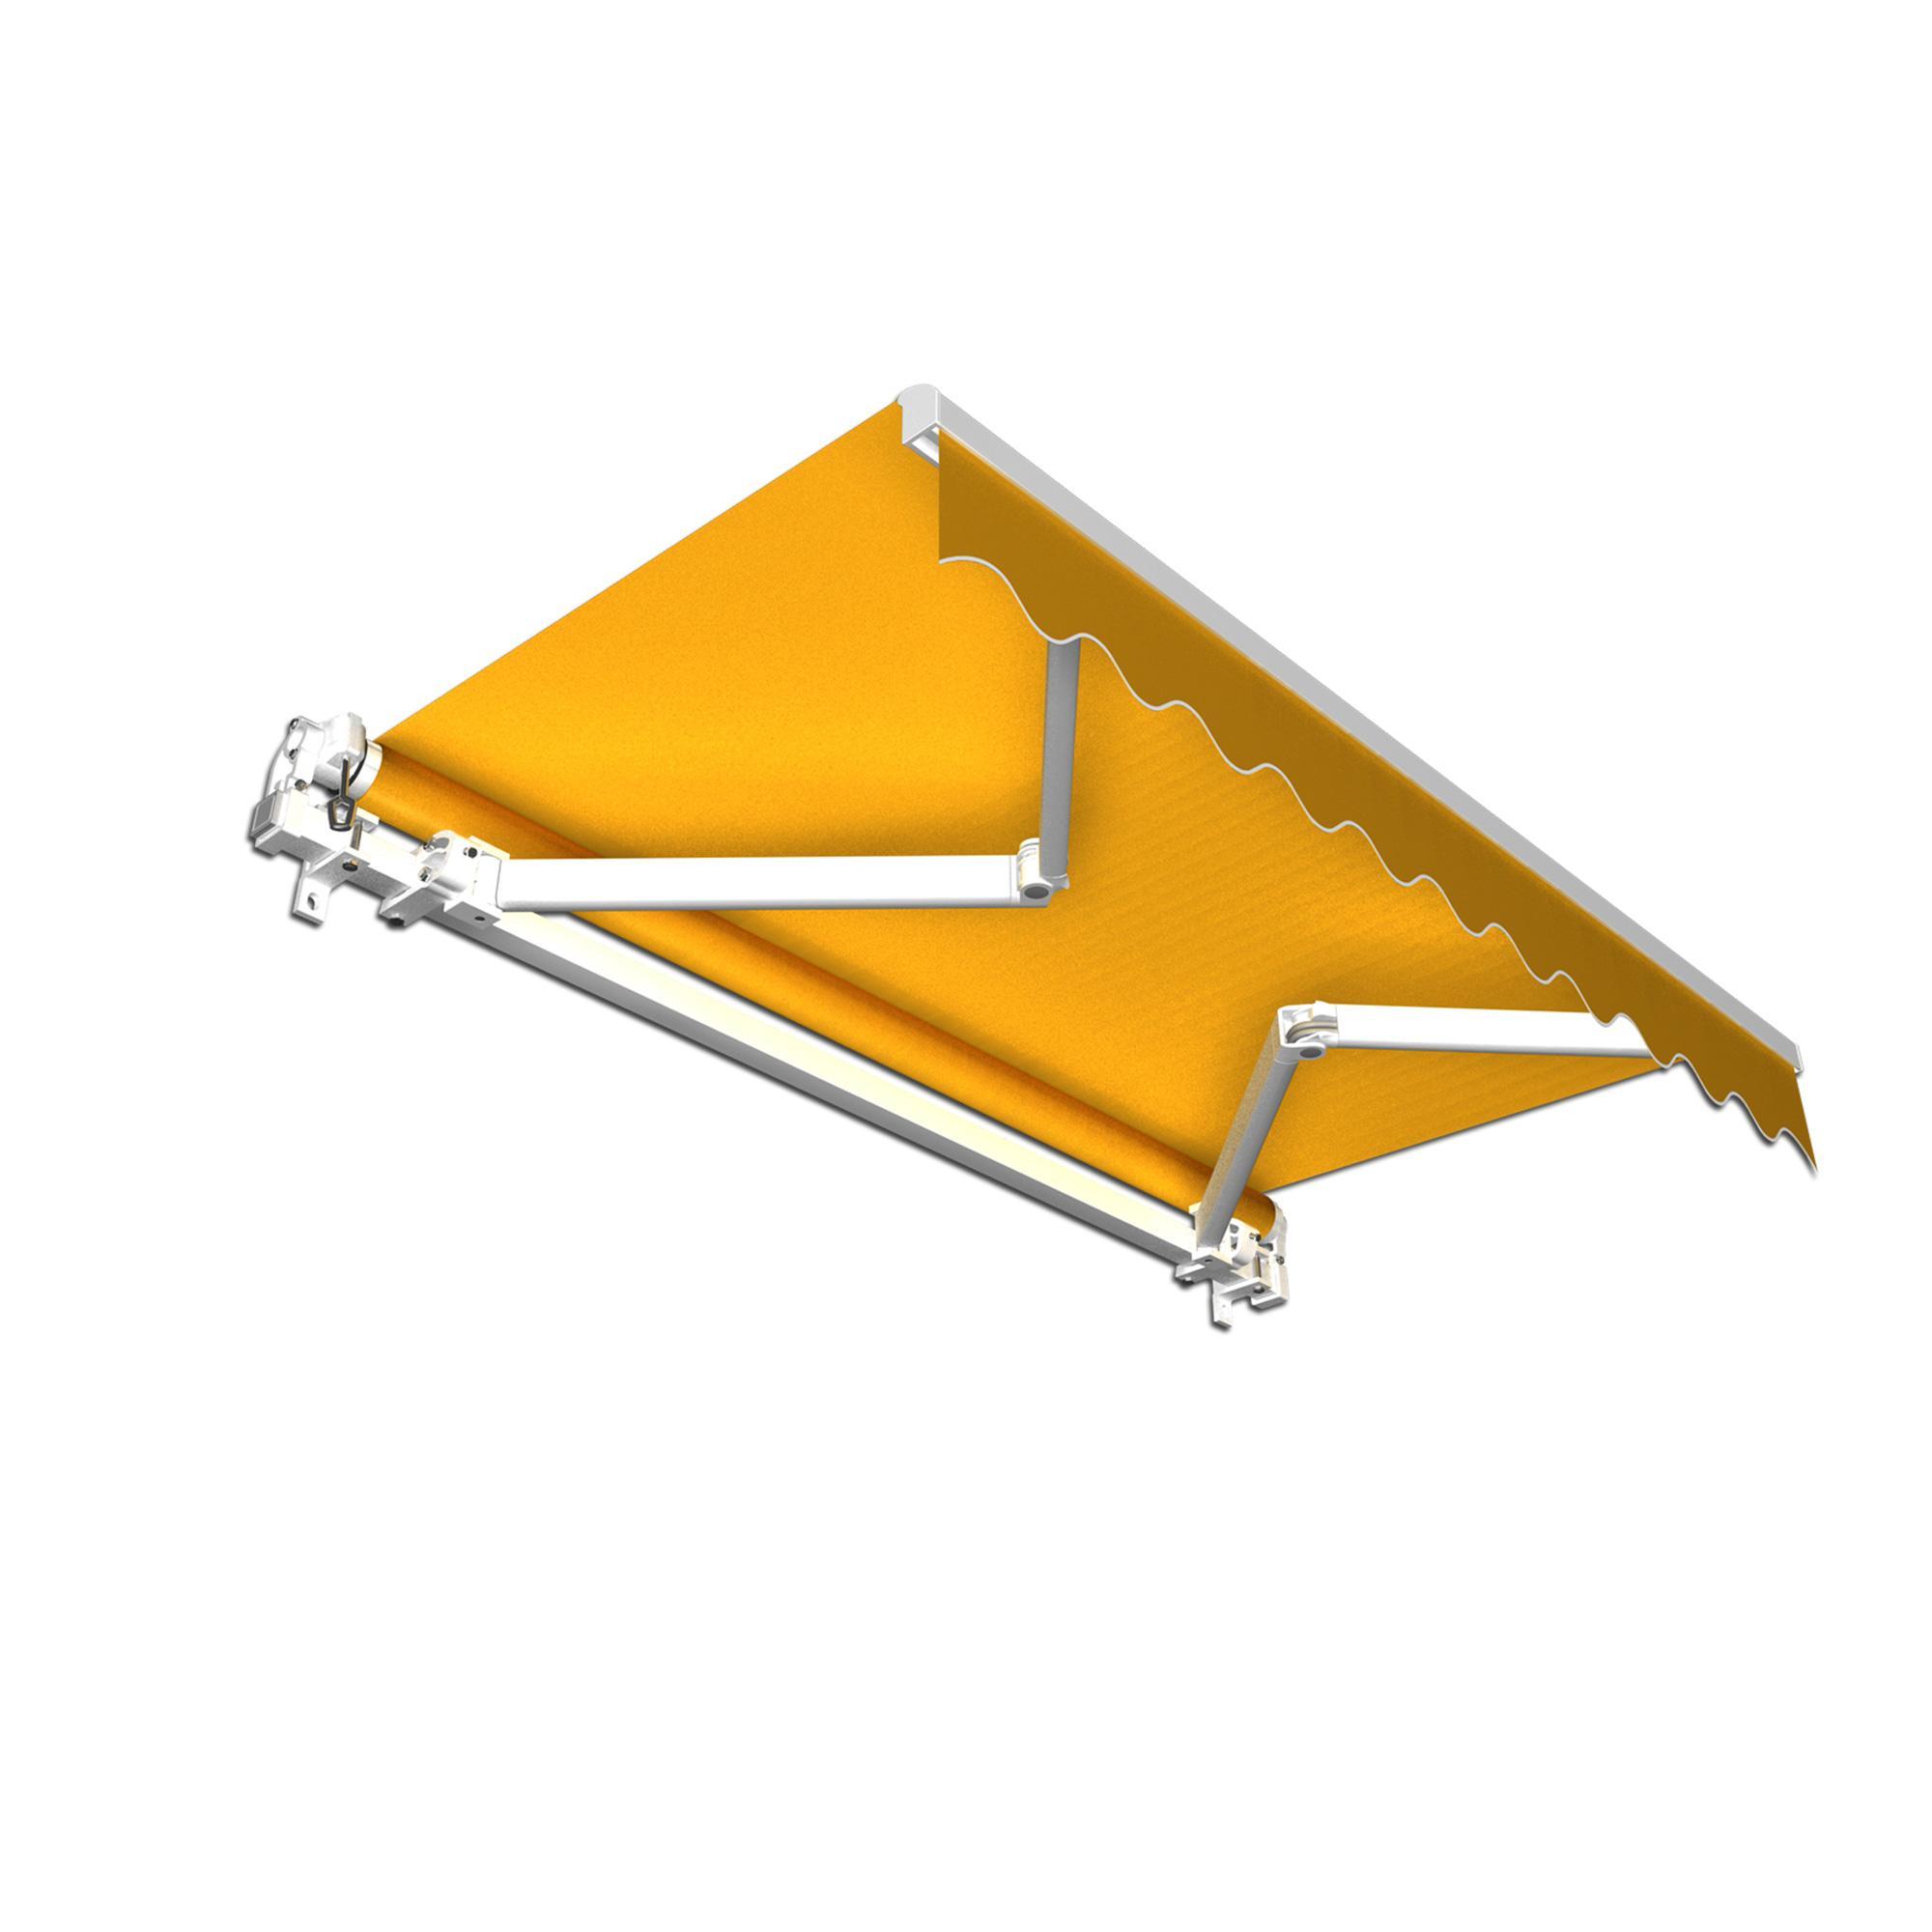 Markiza tarasowa, Gotowa, BASIC, żółta, 350x300 cm